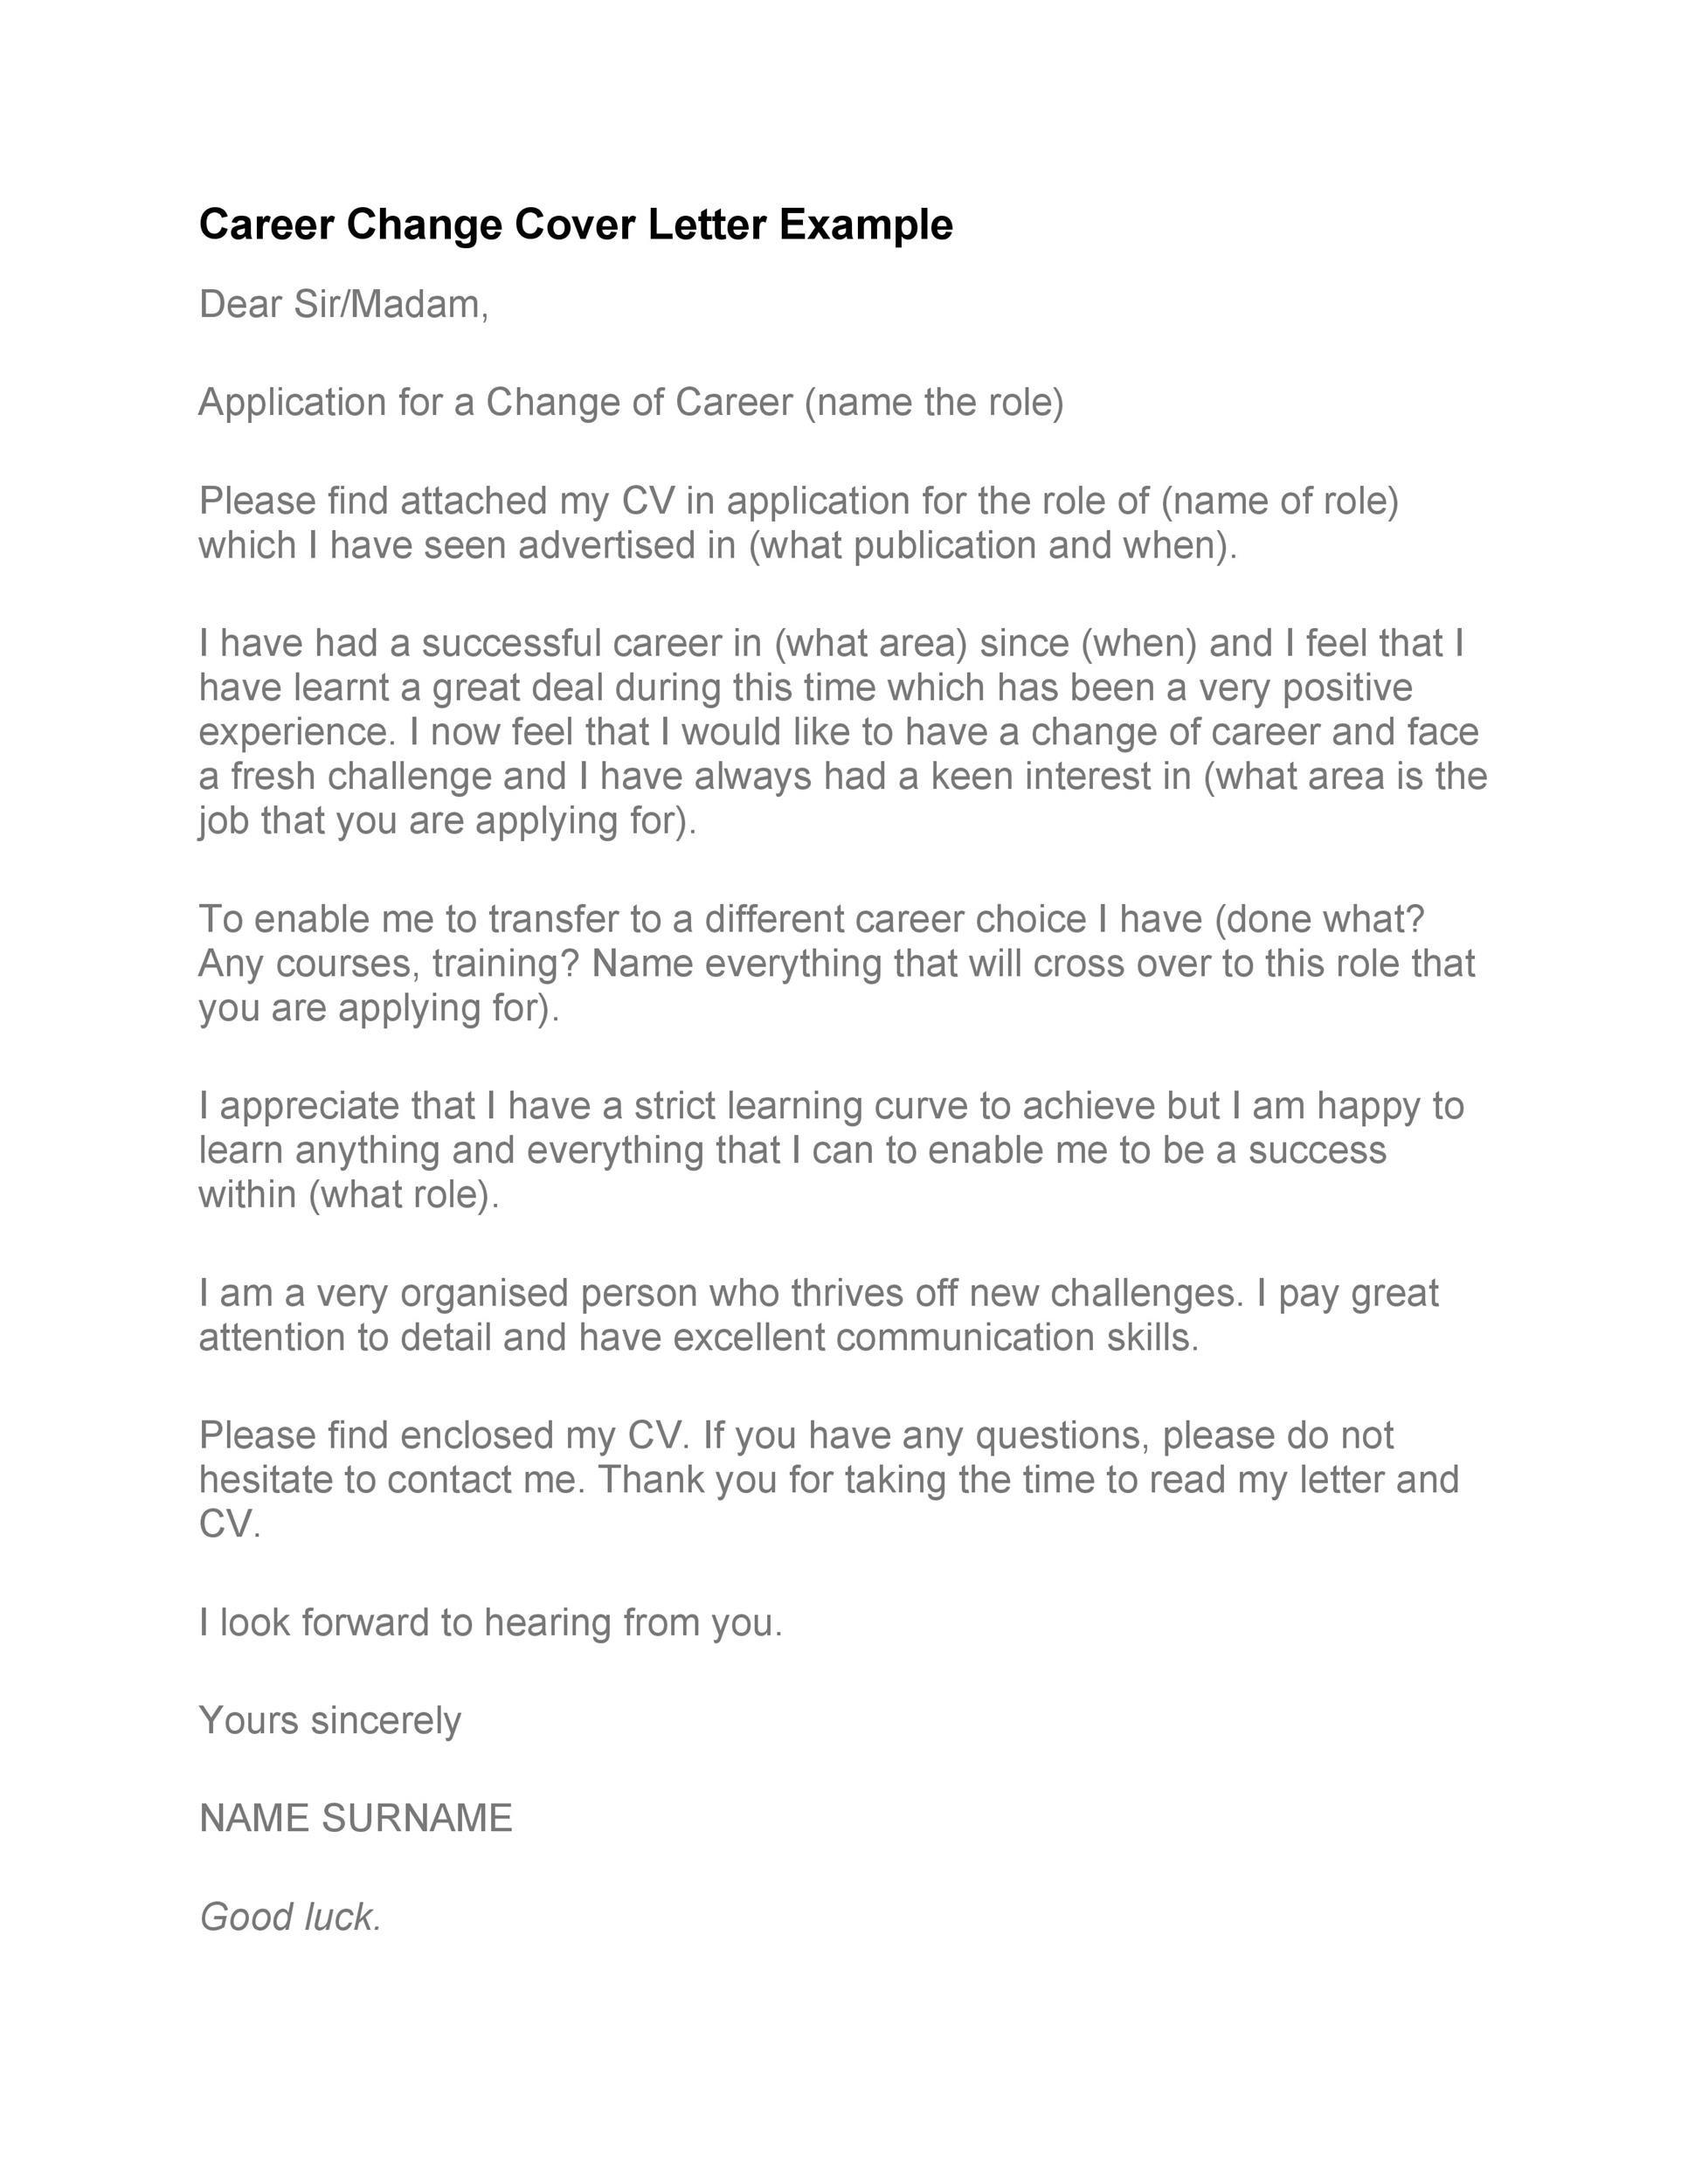 Free career change cover letter 14